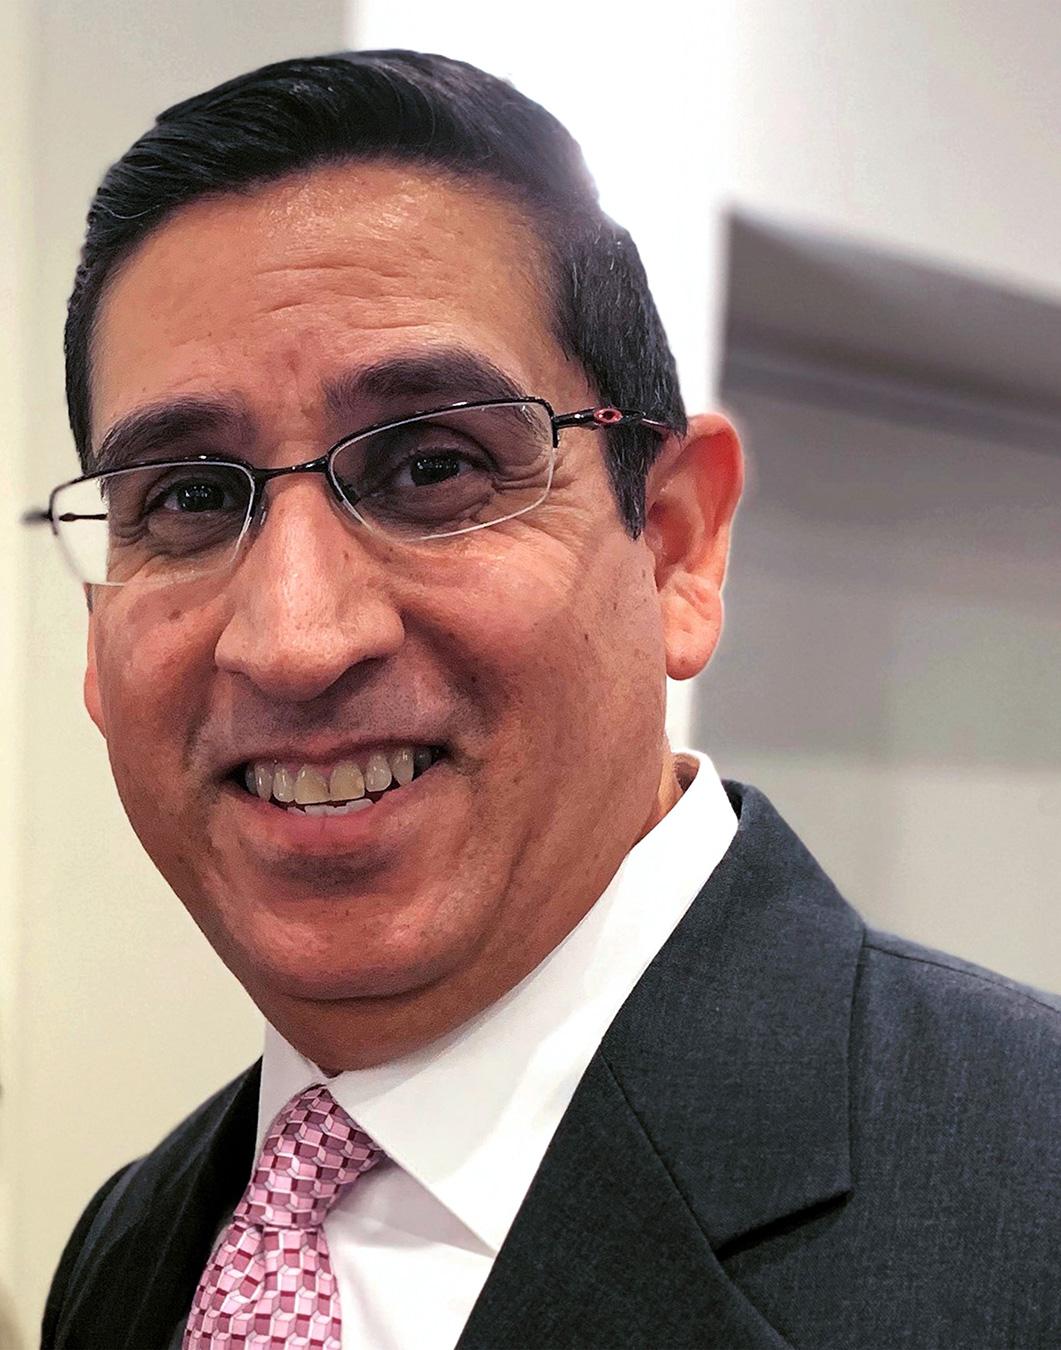 Teo Sierra; Vice President of Corporate Development